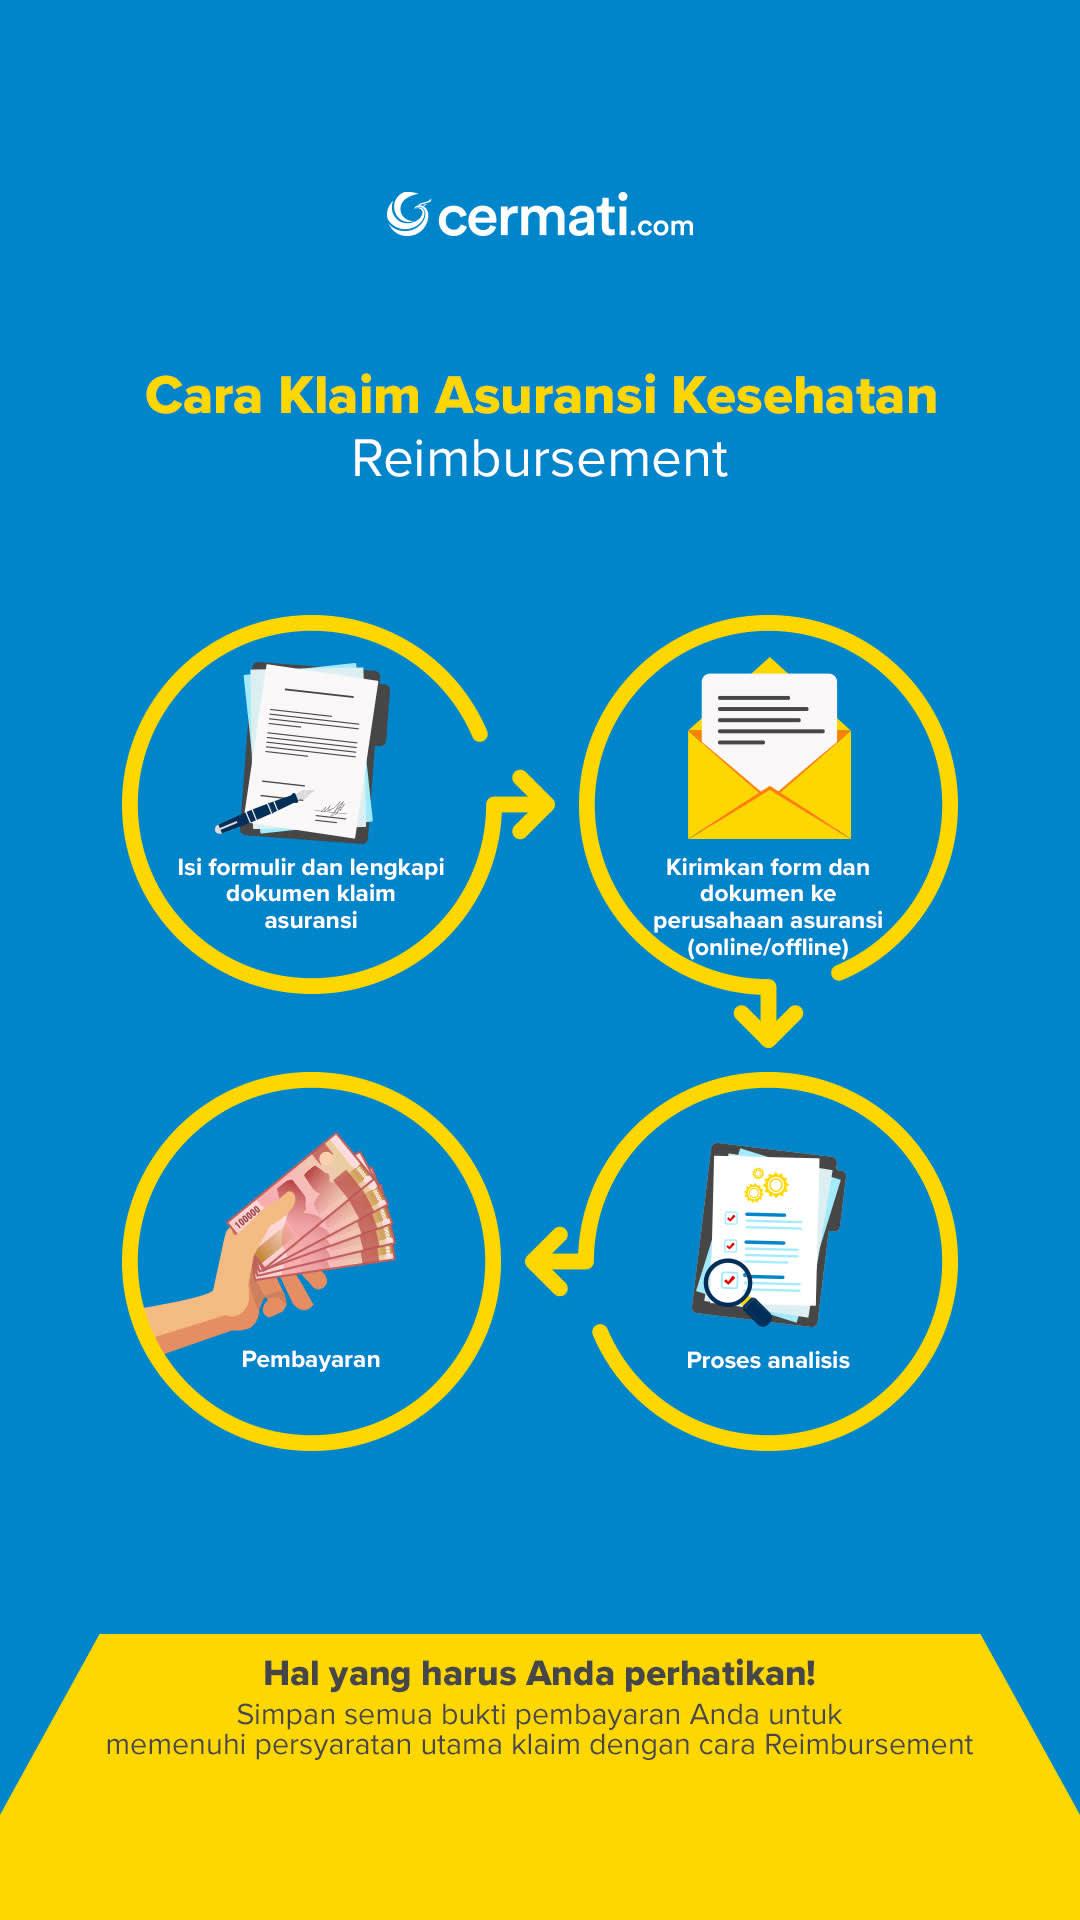 Cara Klaim Asuransi Kesehatan (Reimbursement)-Mobile